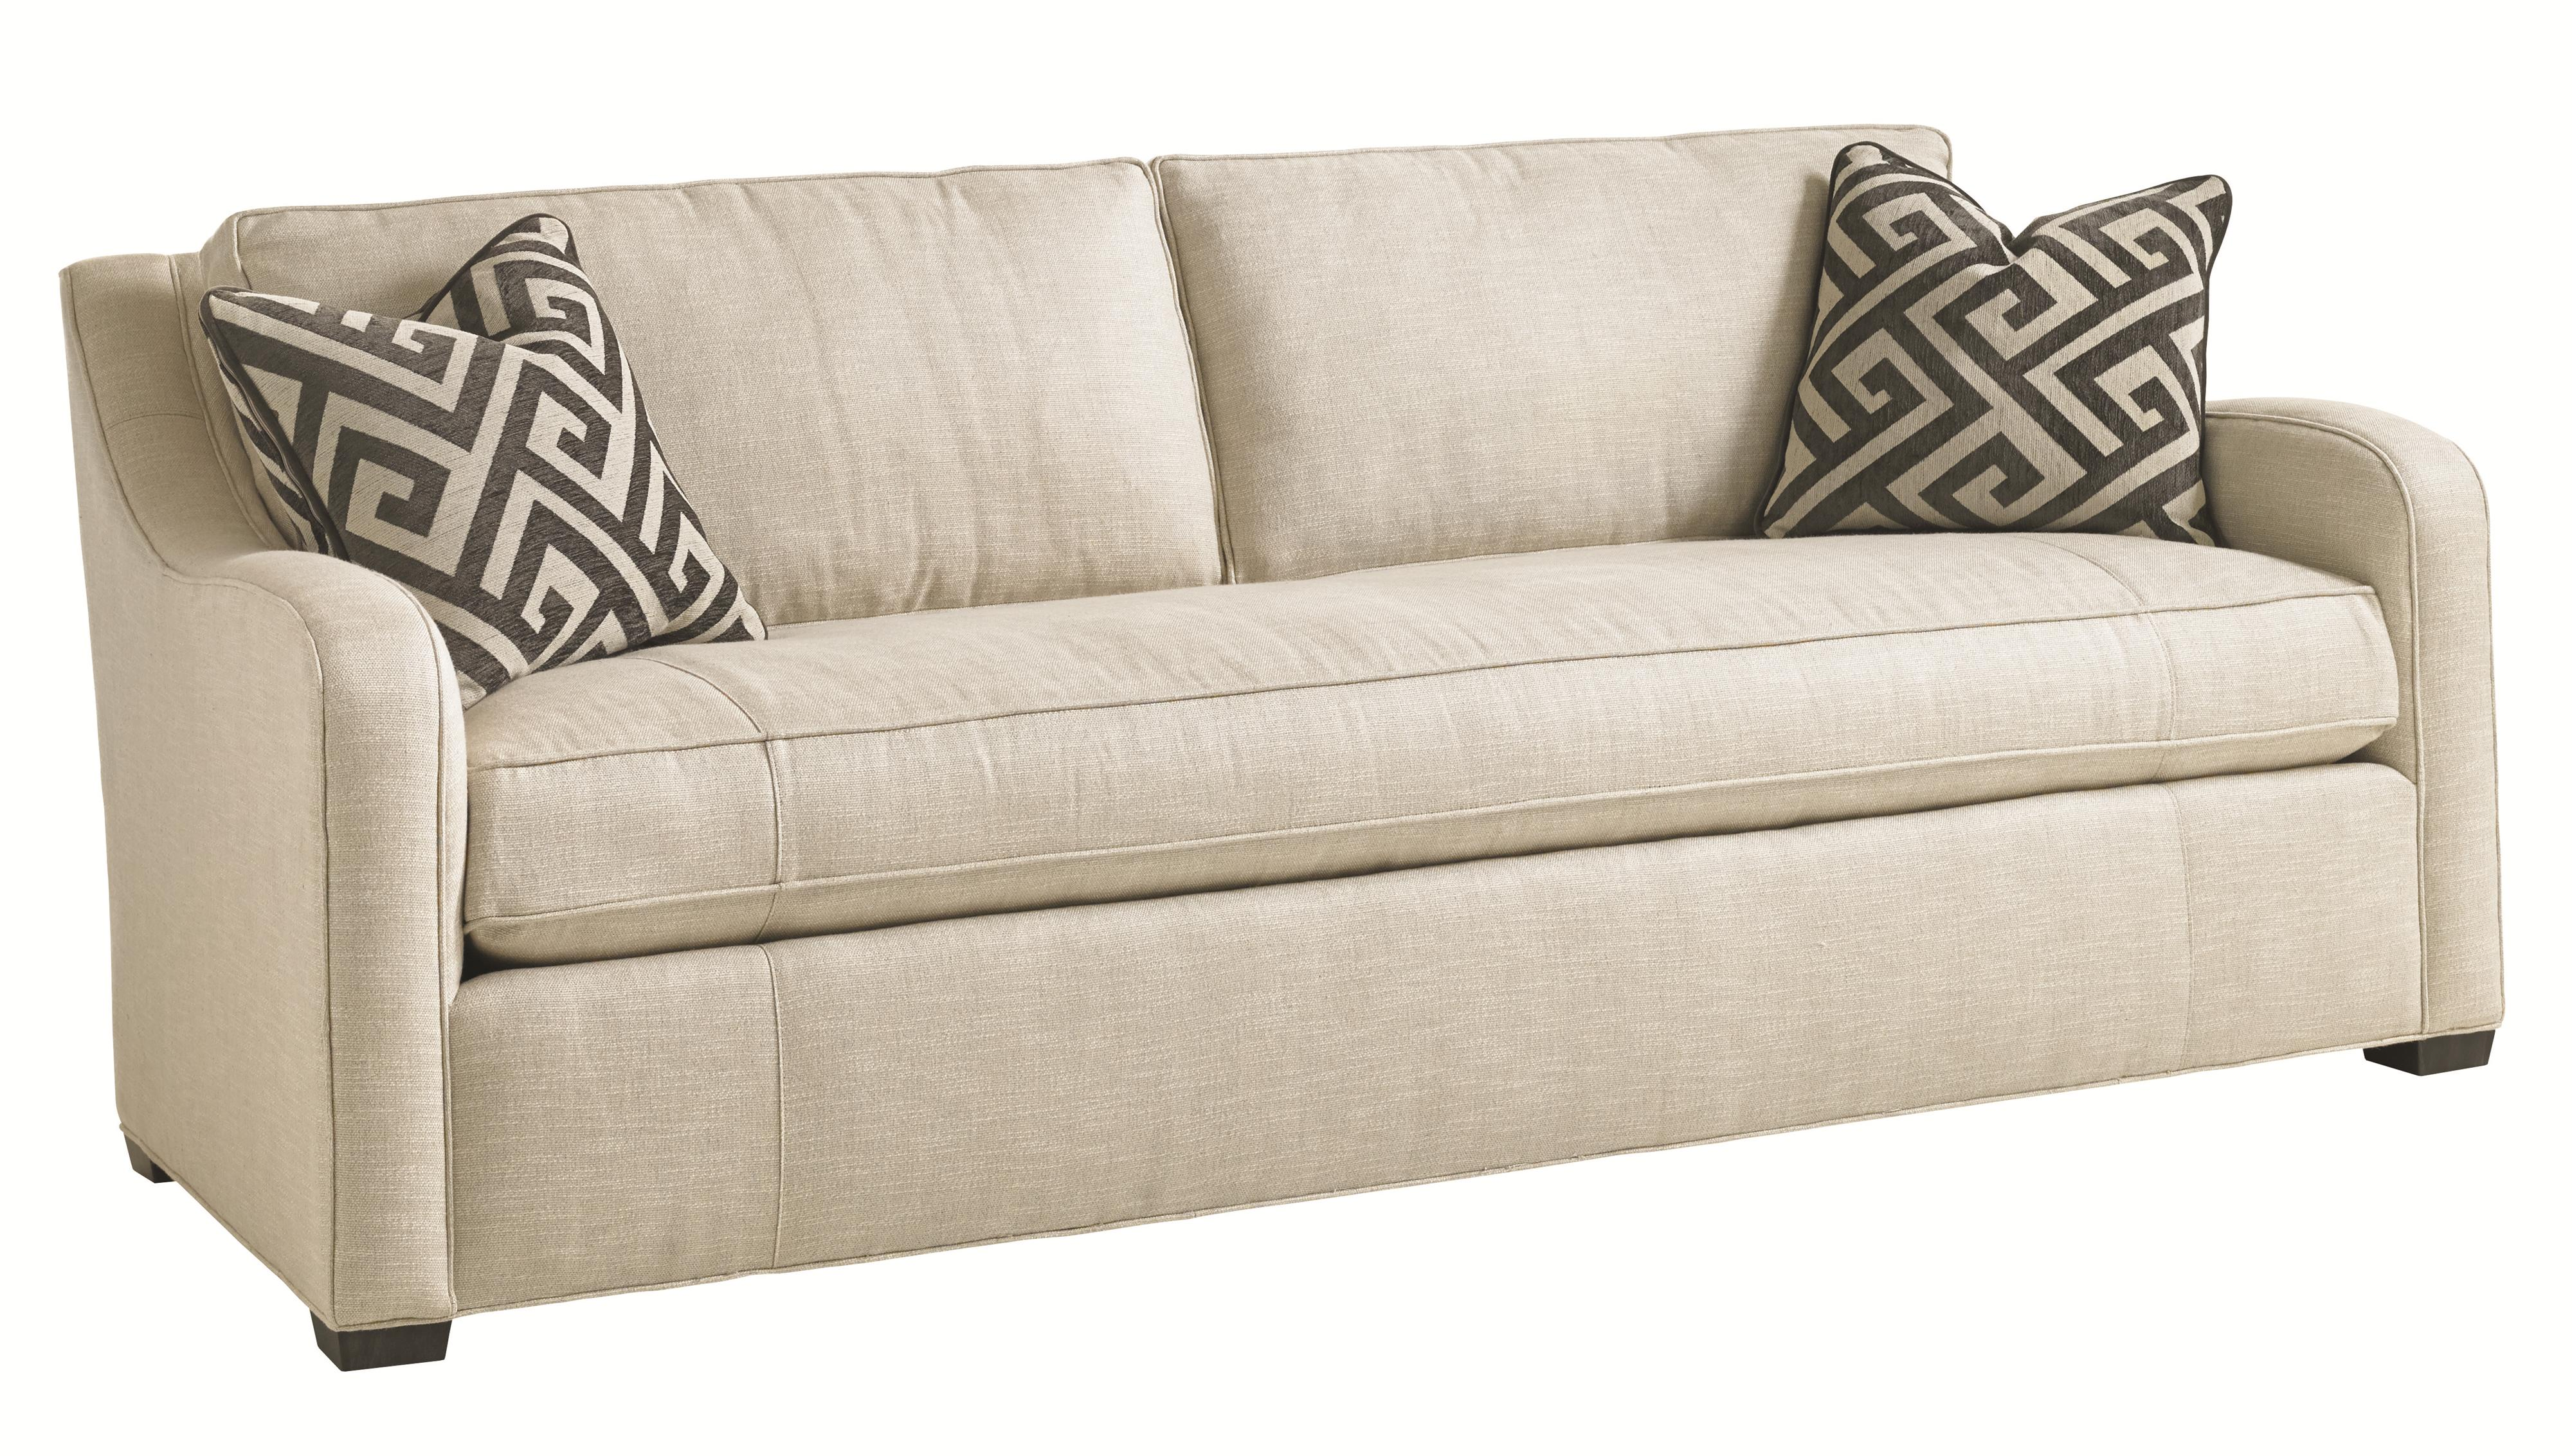 Carrera Fontana Sofa by Lexington at Baer's Furniture